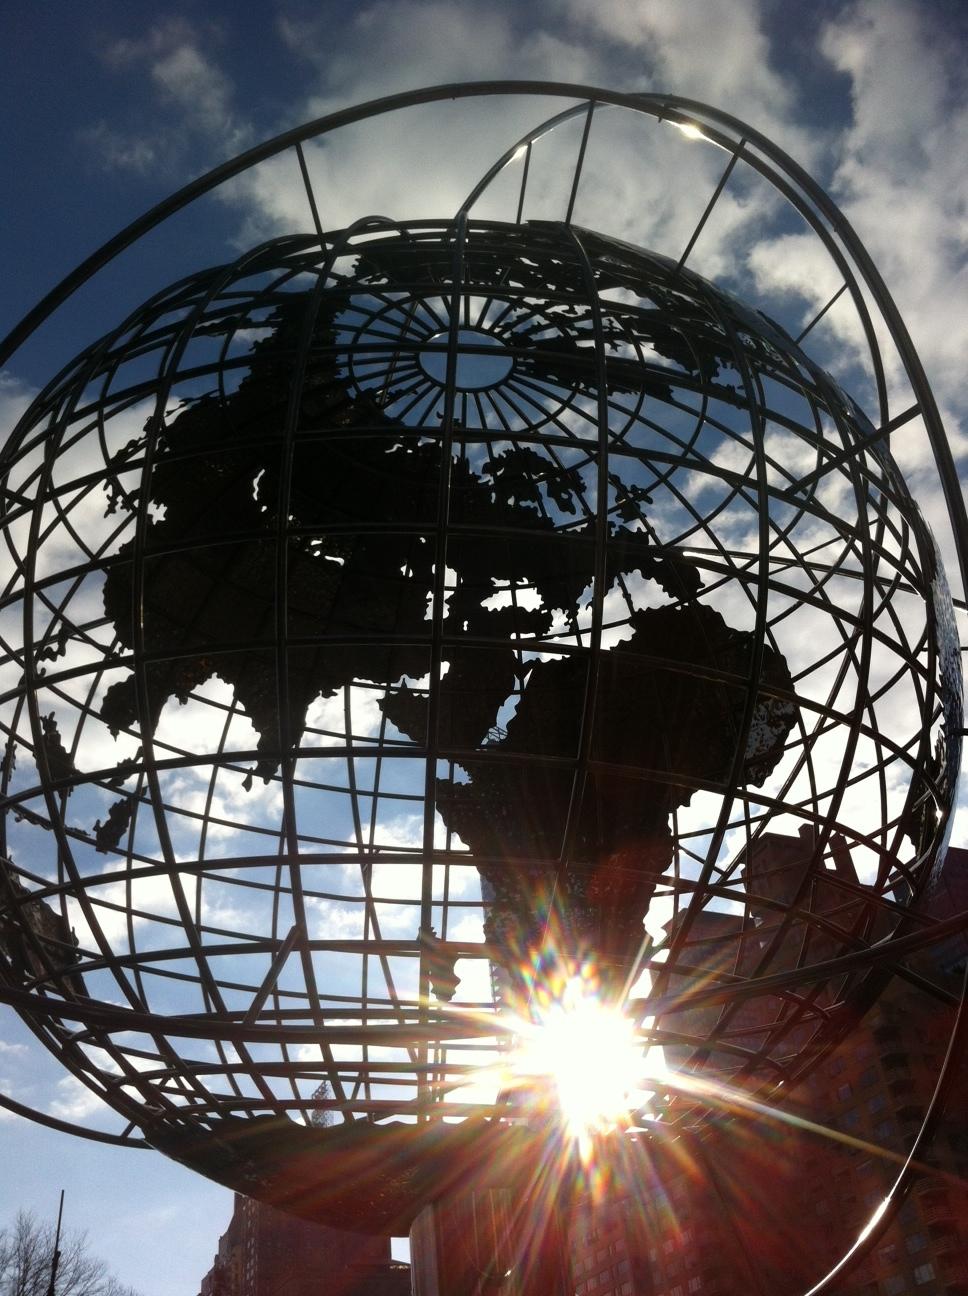 Winter sun streams through the globe in Columbus Circle.